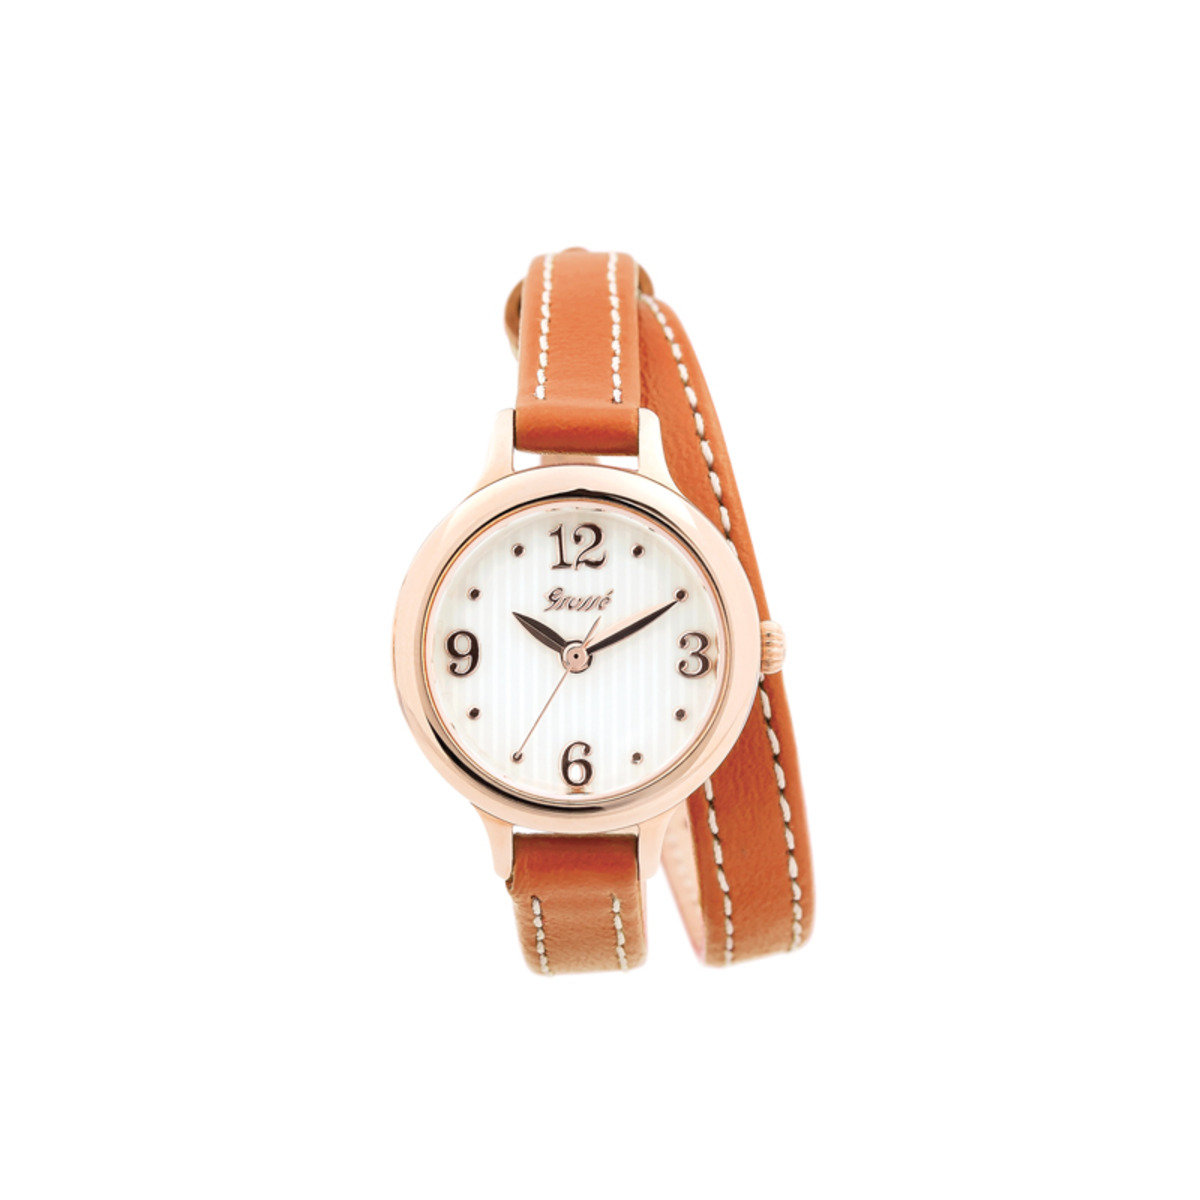 Lumiere et Ombre女裝腕錶